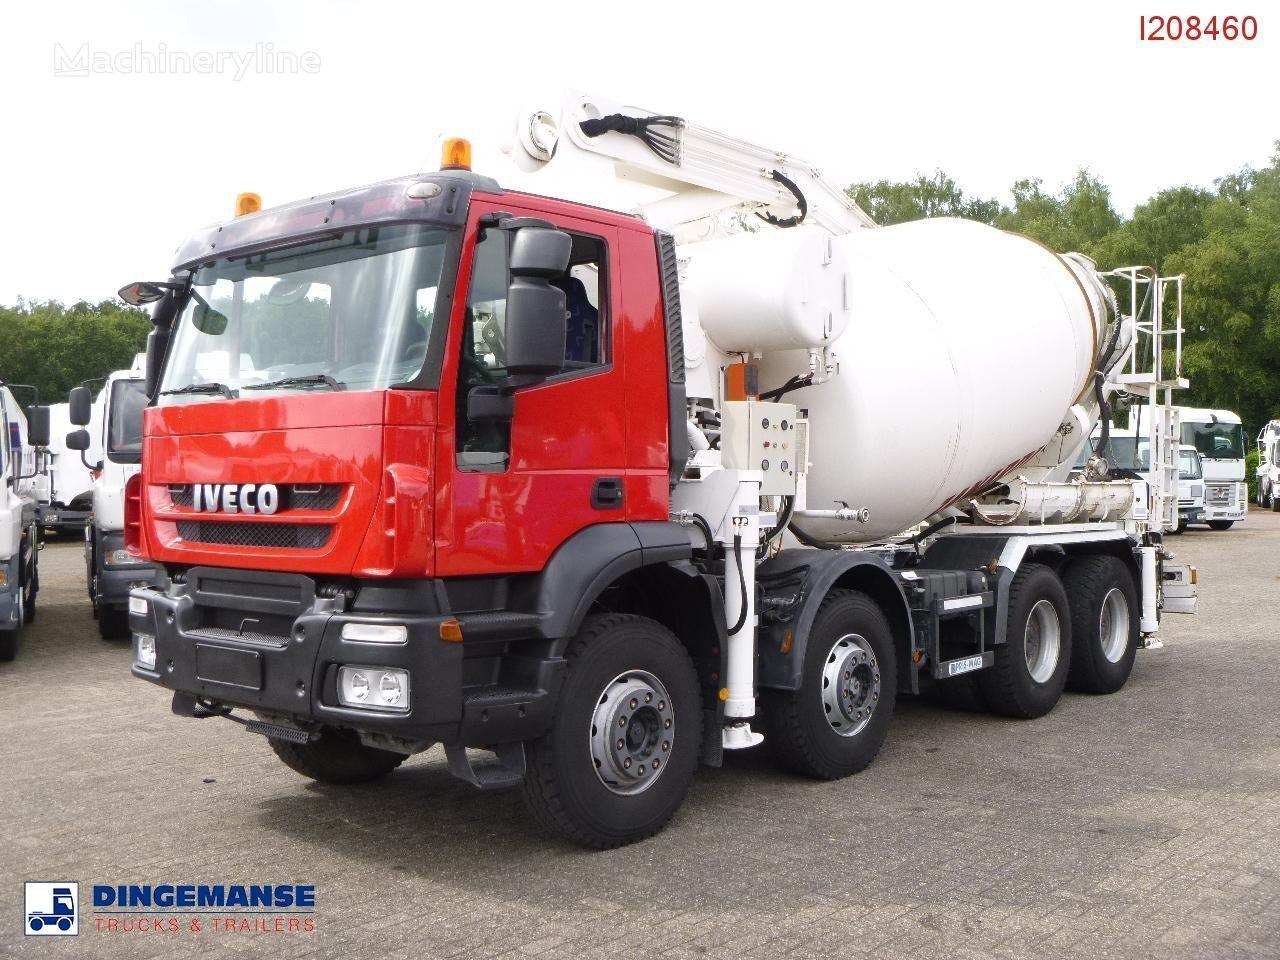 бетон-помпа IVECO AD410T45 8x4 pump/mixer 28 m